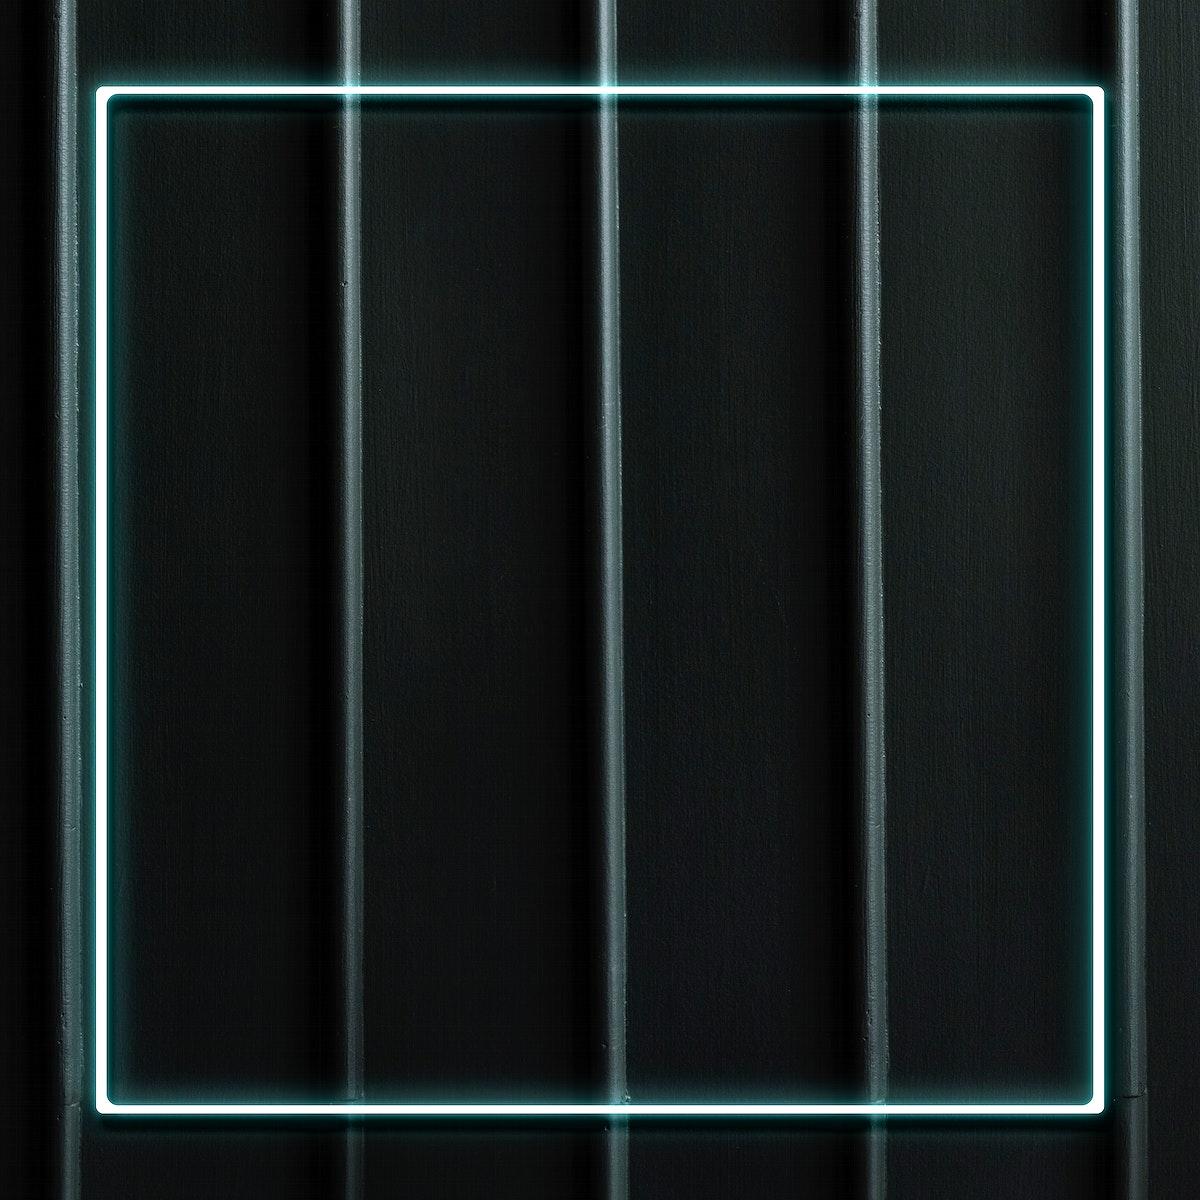 Blue neon frame social ads template illustration